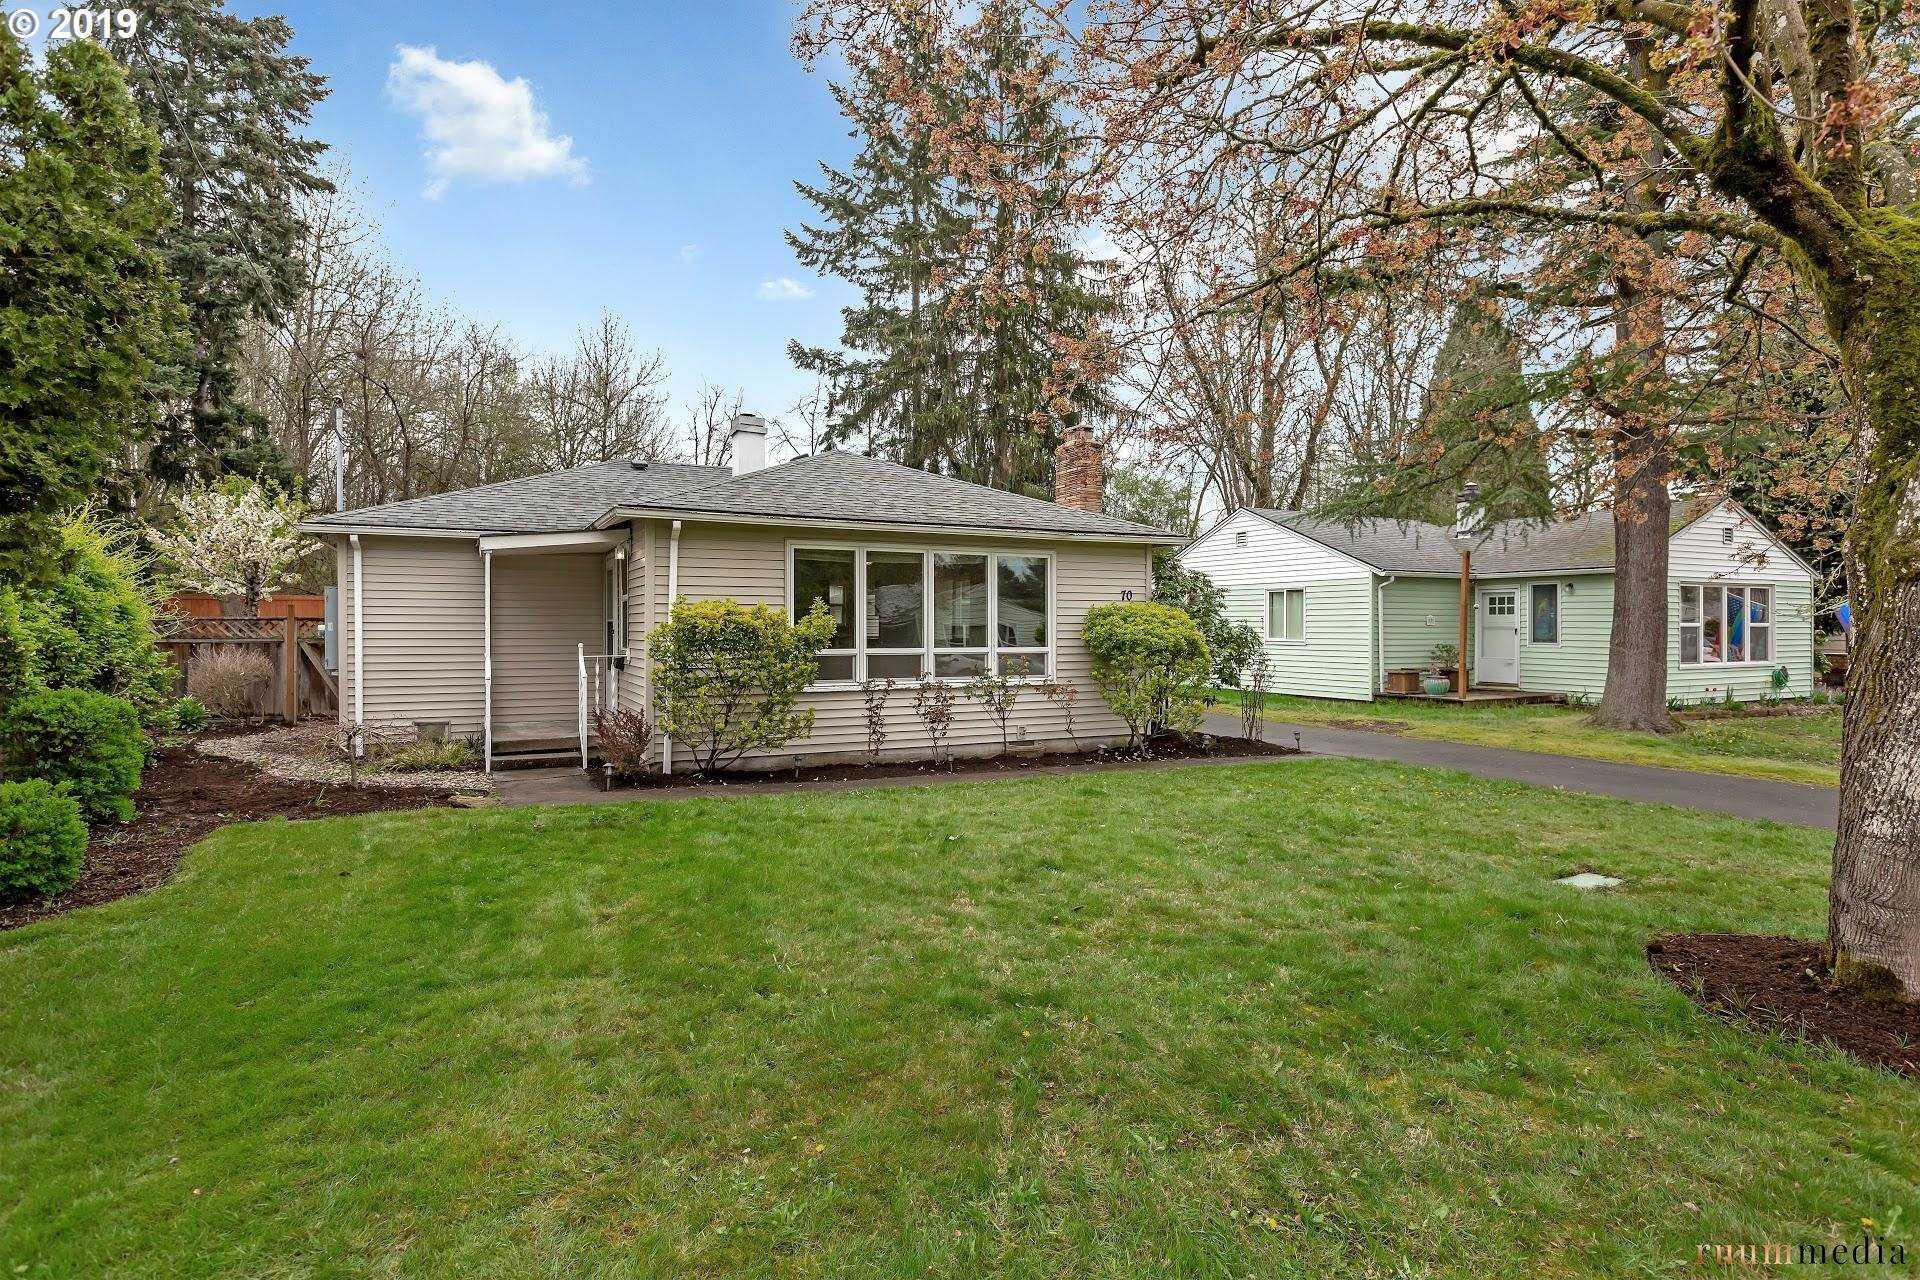 $340,000 - 3Br/1Ba -  for Sale in Marlene Village, Beaverton